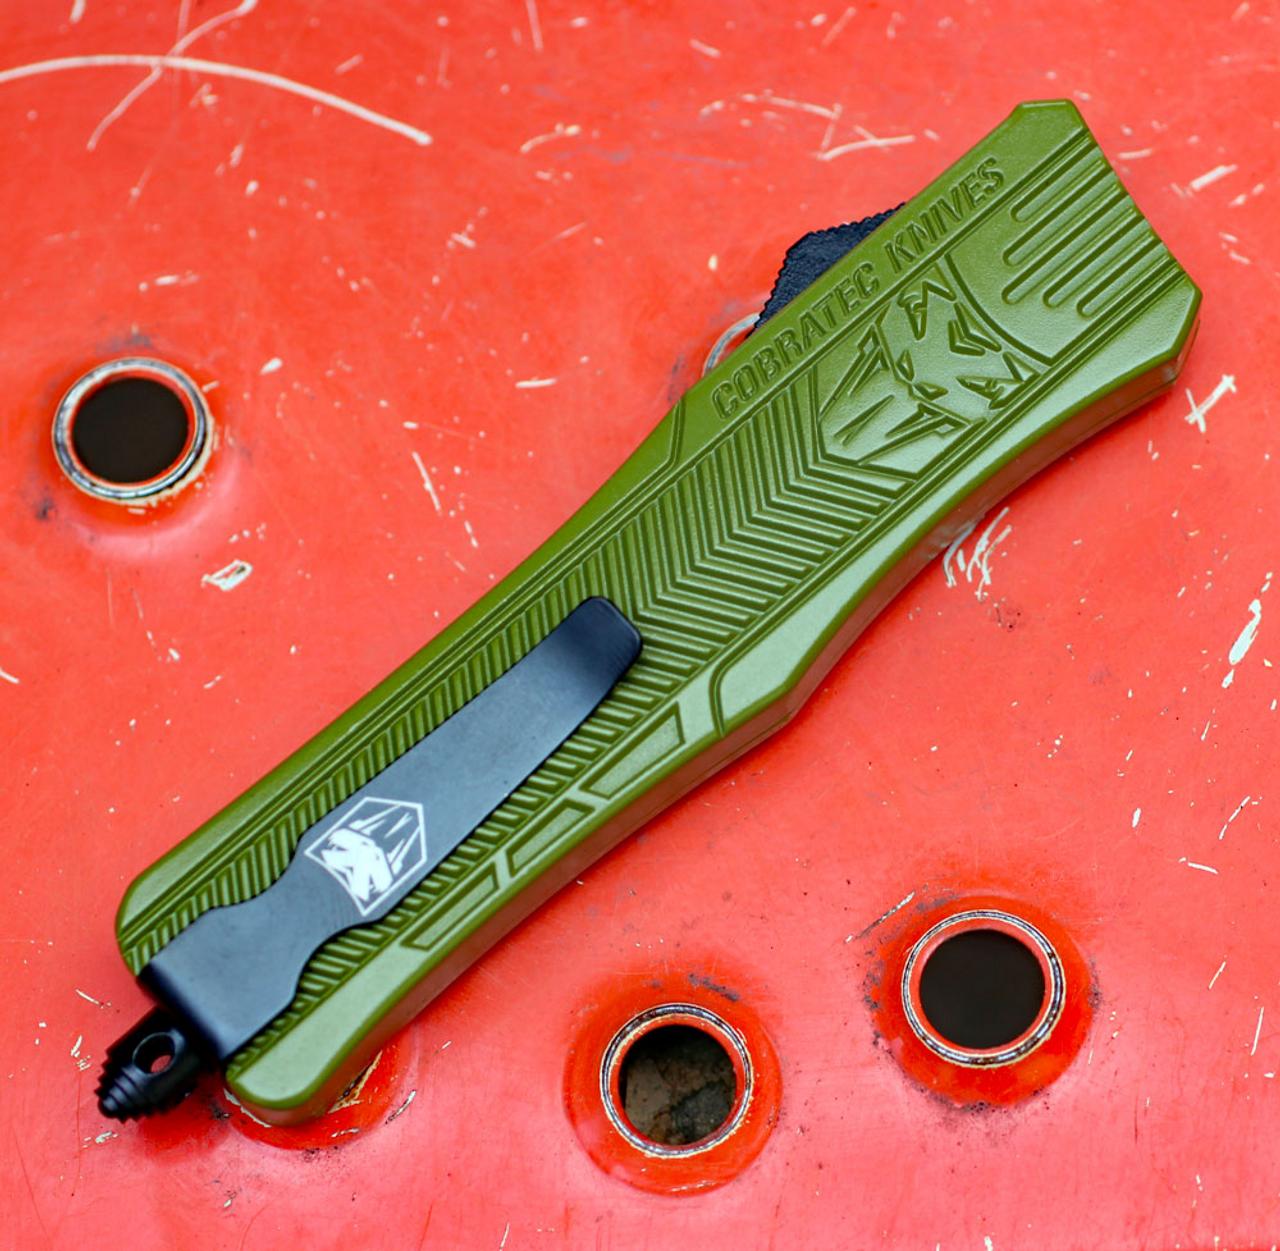 CobraTec Knives MODCTK-1MDAGNS Medium CTK-1 OD-Green, Dagger Blade